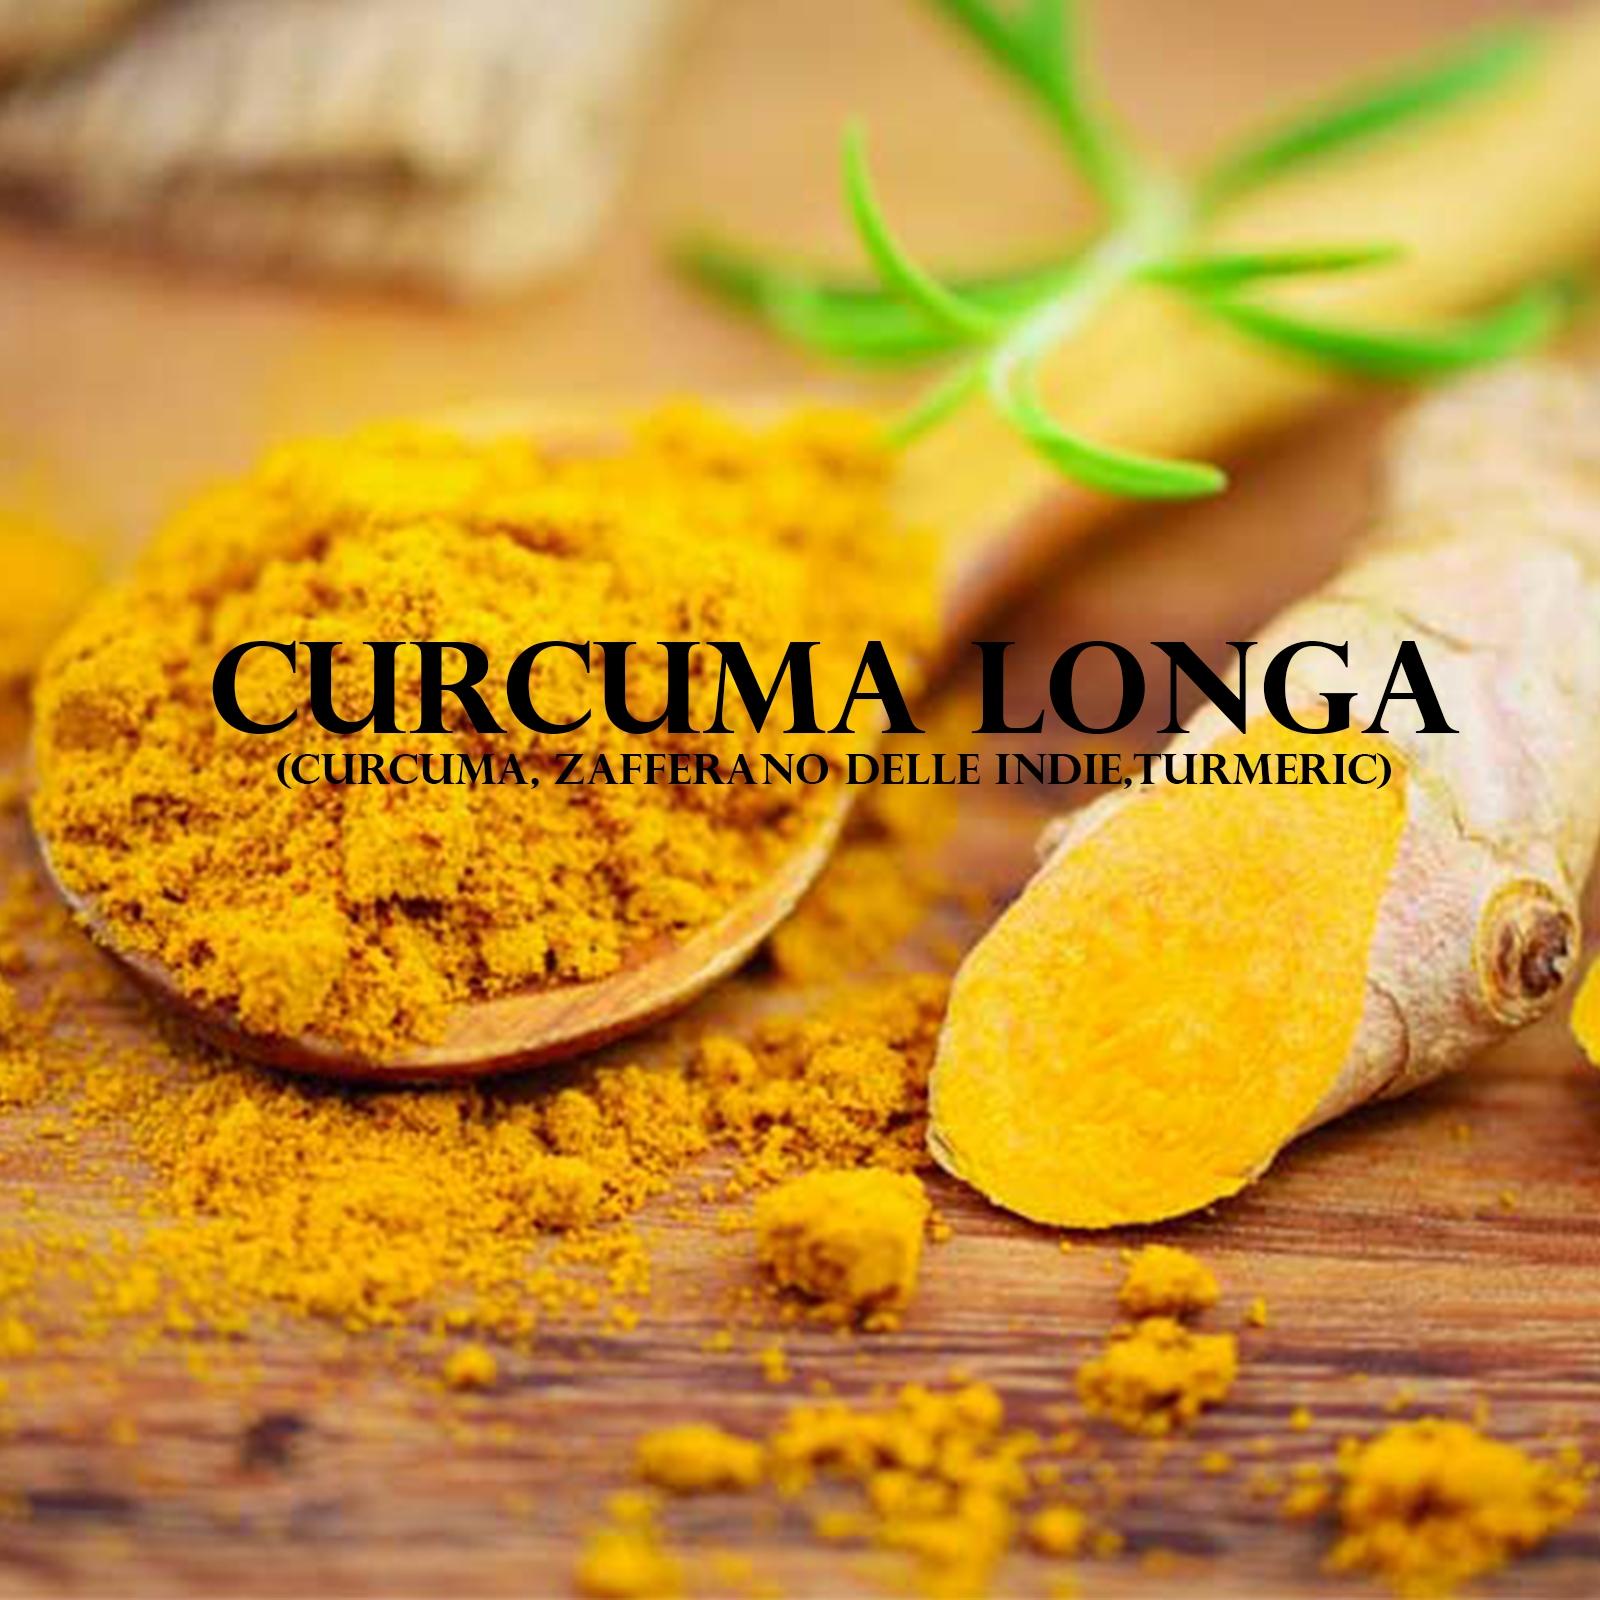 Curcuma Longa (Curcuma, Zafferano delle Indie,Turmeric)